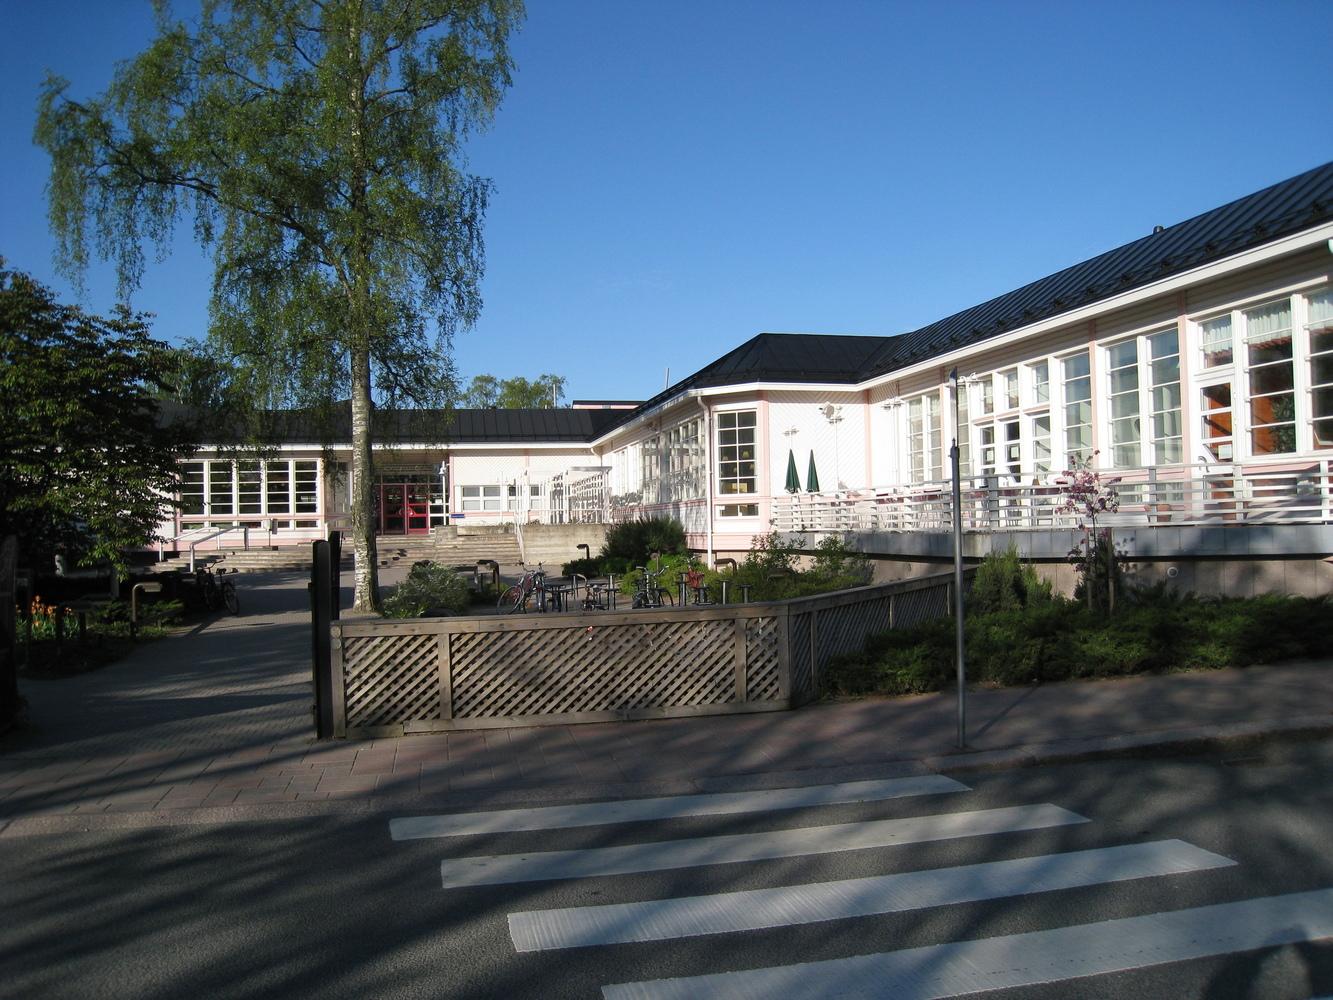 Salo huvudbibliotek